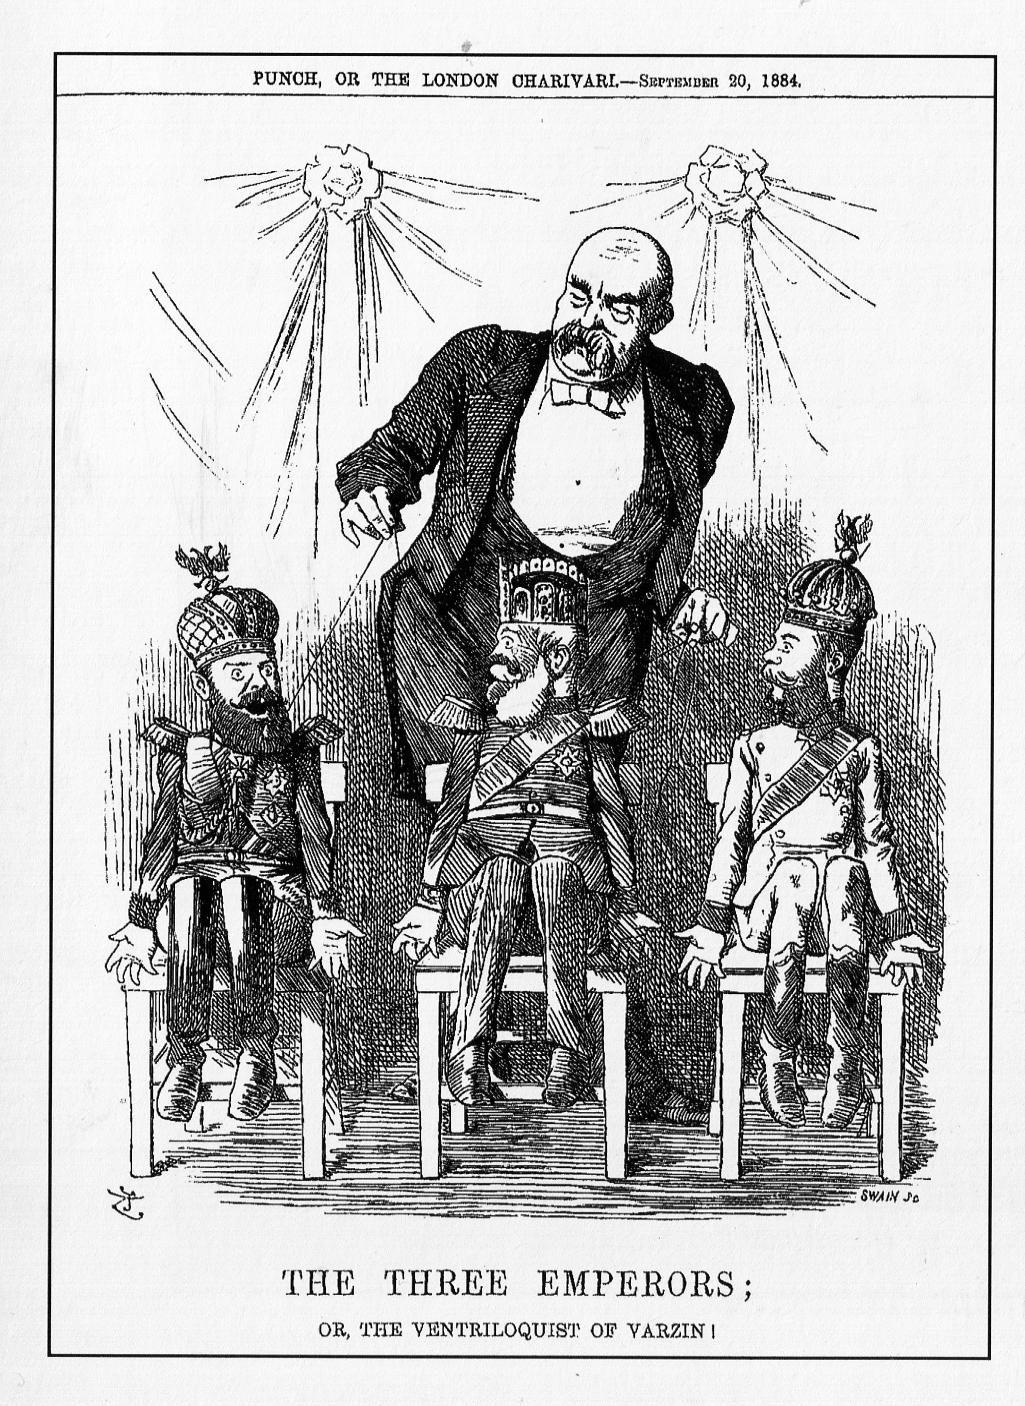 By Неизвестен (Скан иллюстрации в Punch) [Public domain], via Wikimedia Commons